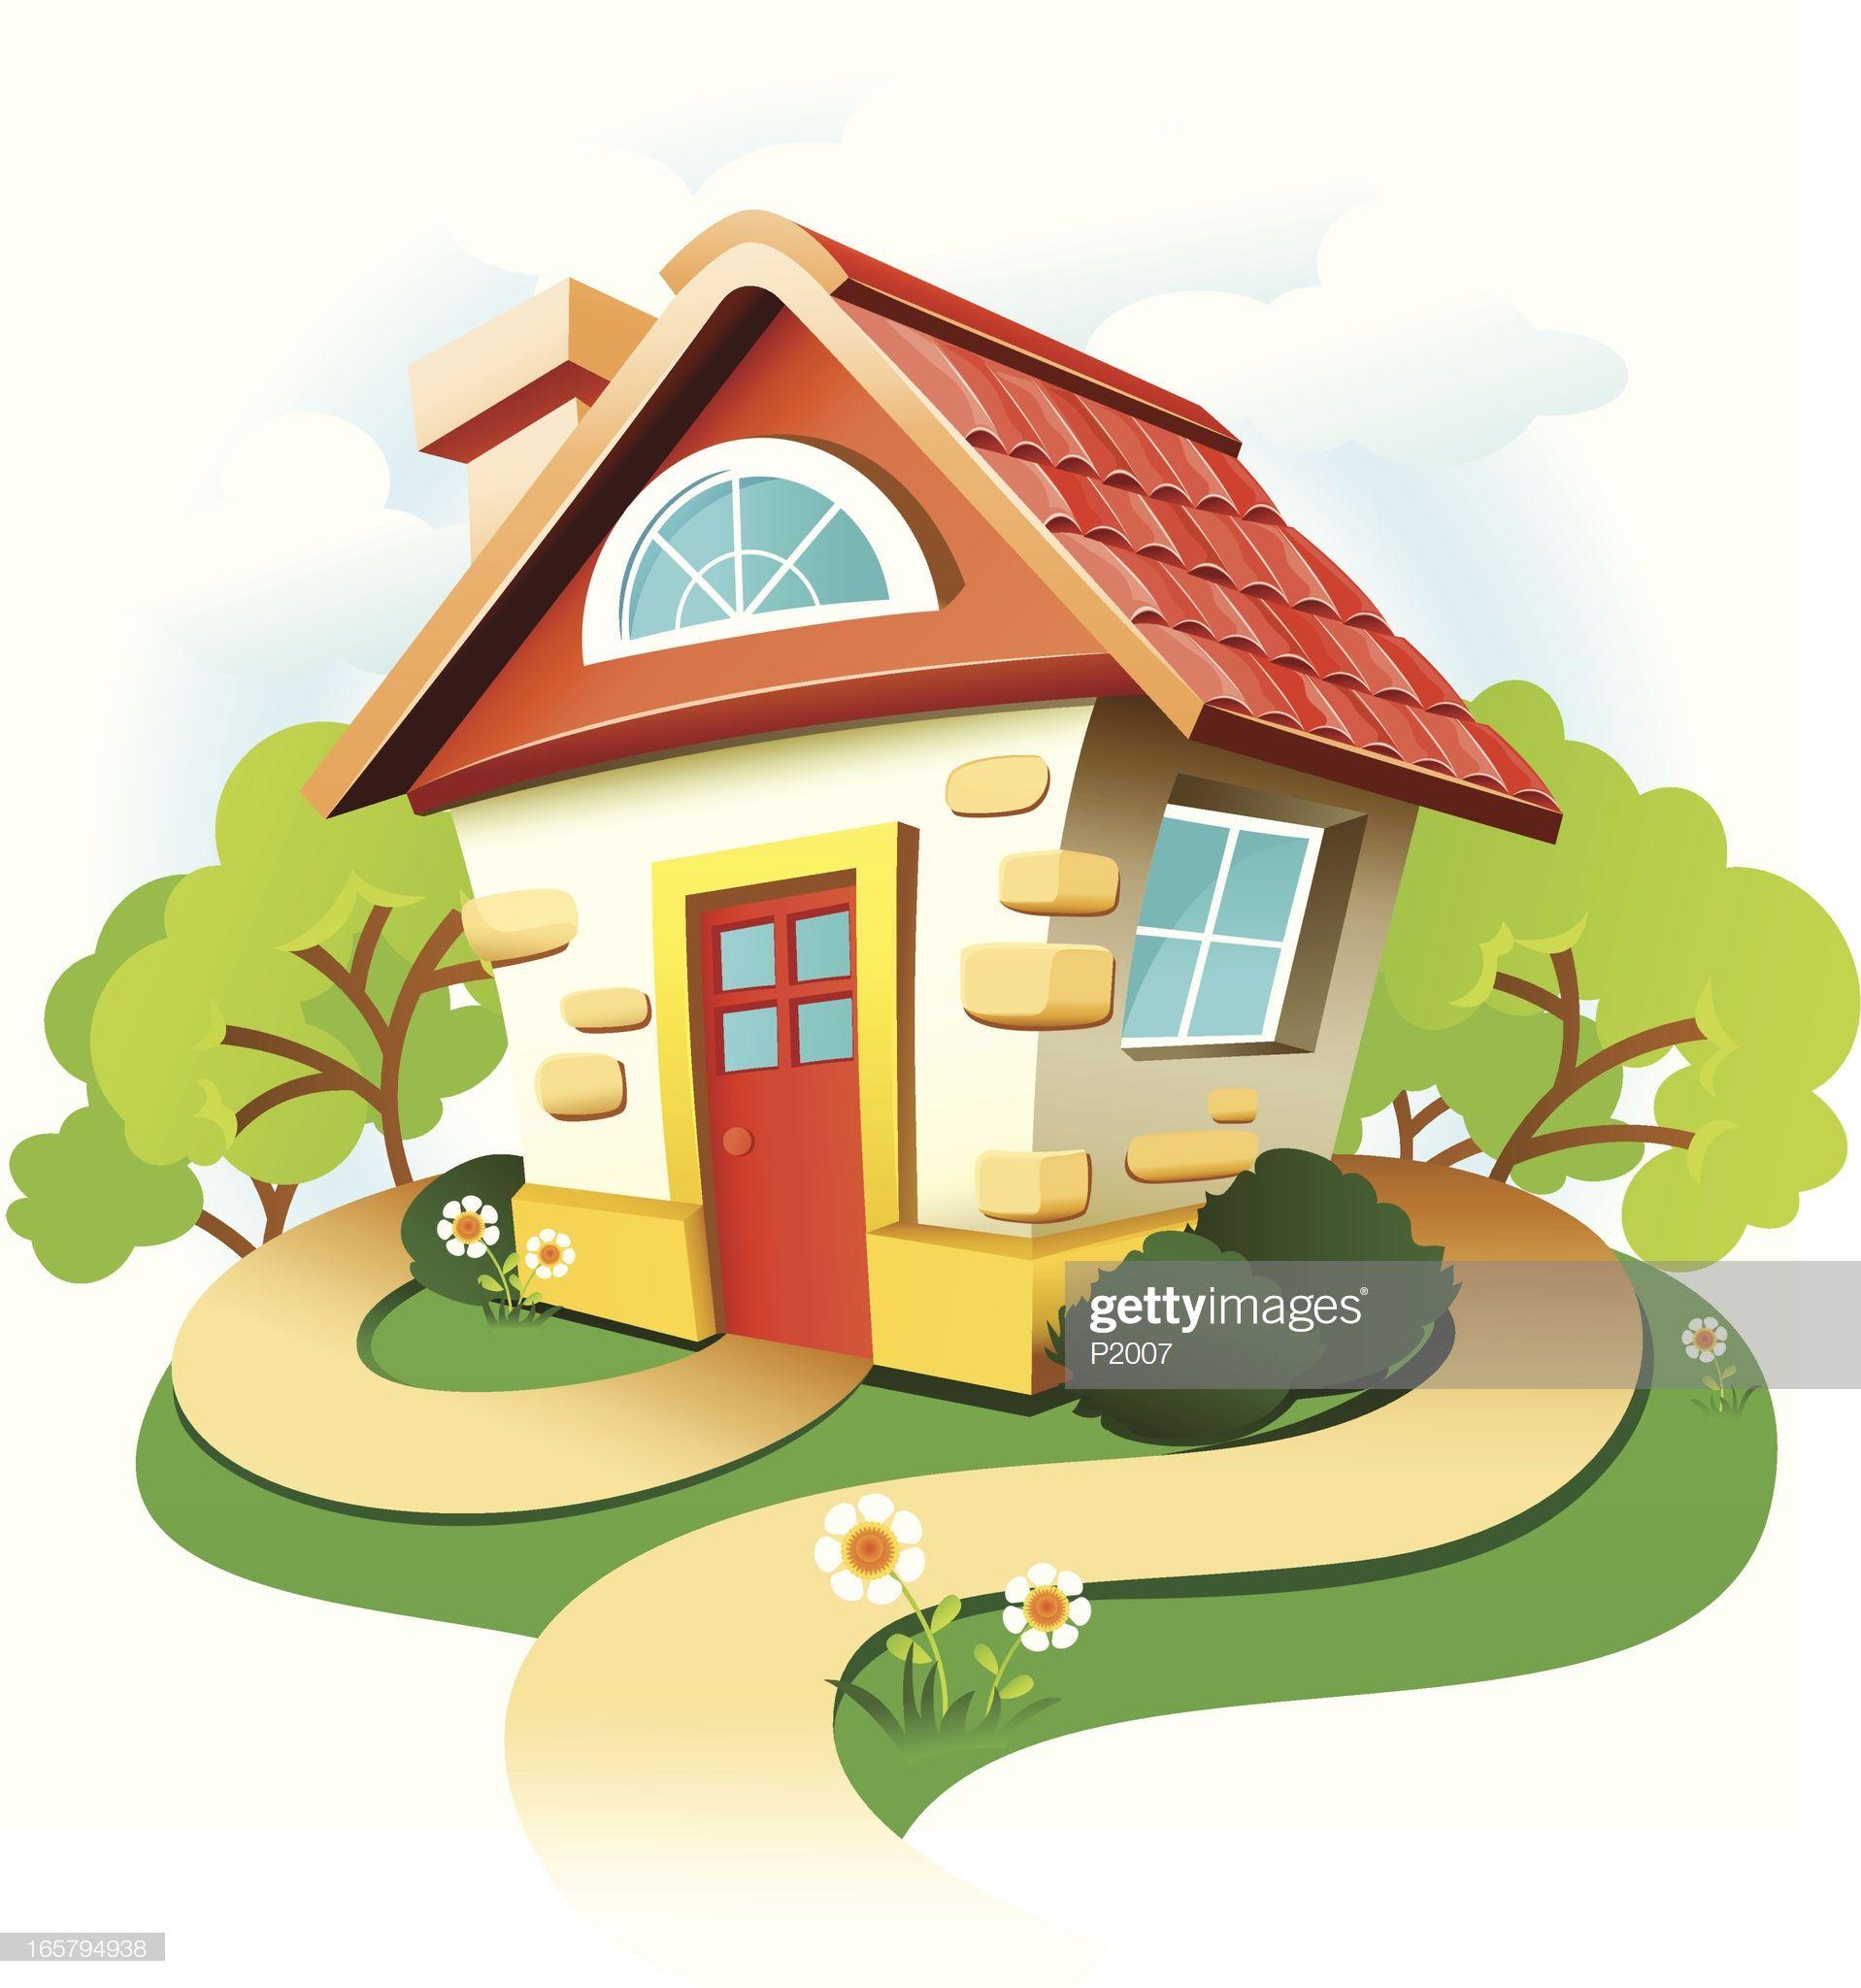 Vector Illustration Of A Cute Little Cottage High Resolution Jpg En 2020 Deco Creche Illustration Maison De Campagne